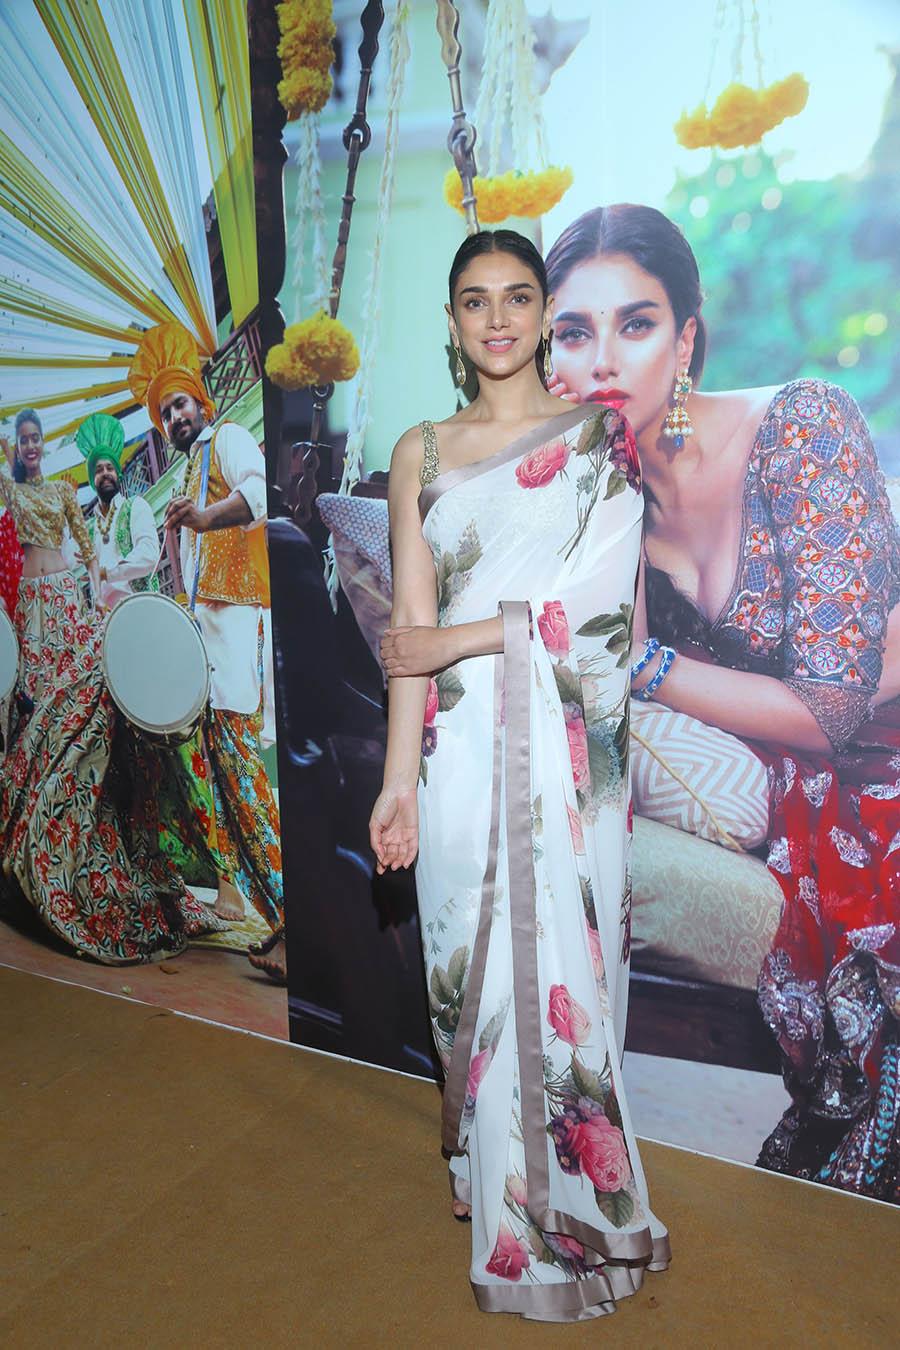 Vogue-Wedding-Show-2017s-brand-ambassador-Aditi-Rao-Hydari-in-Sabyasachi-sari-and-jewellery